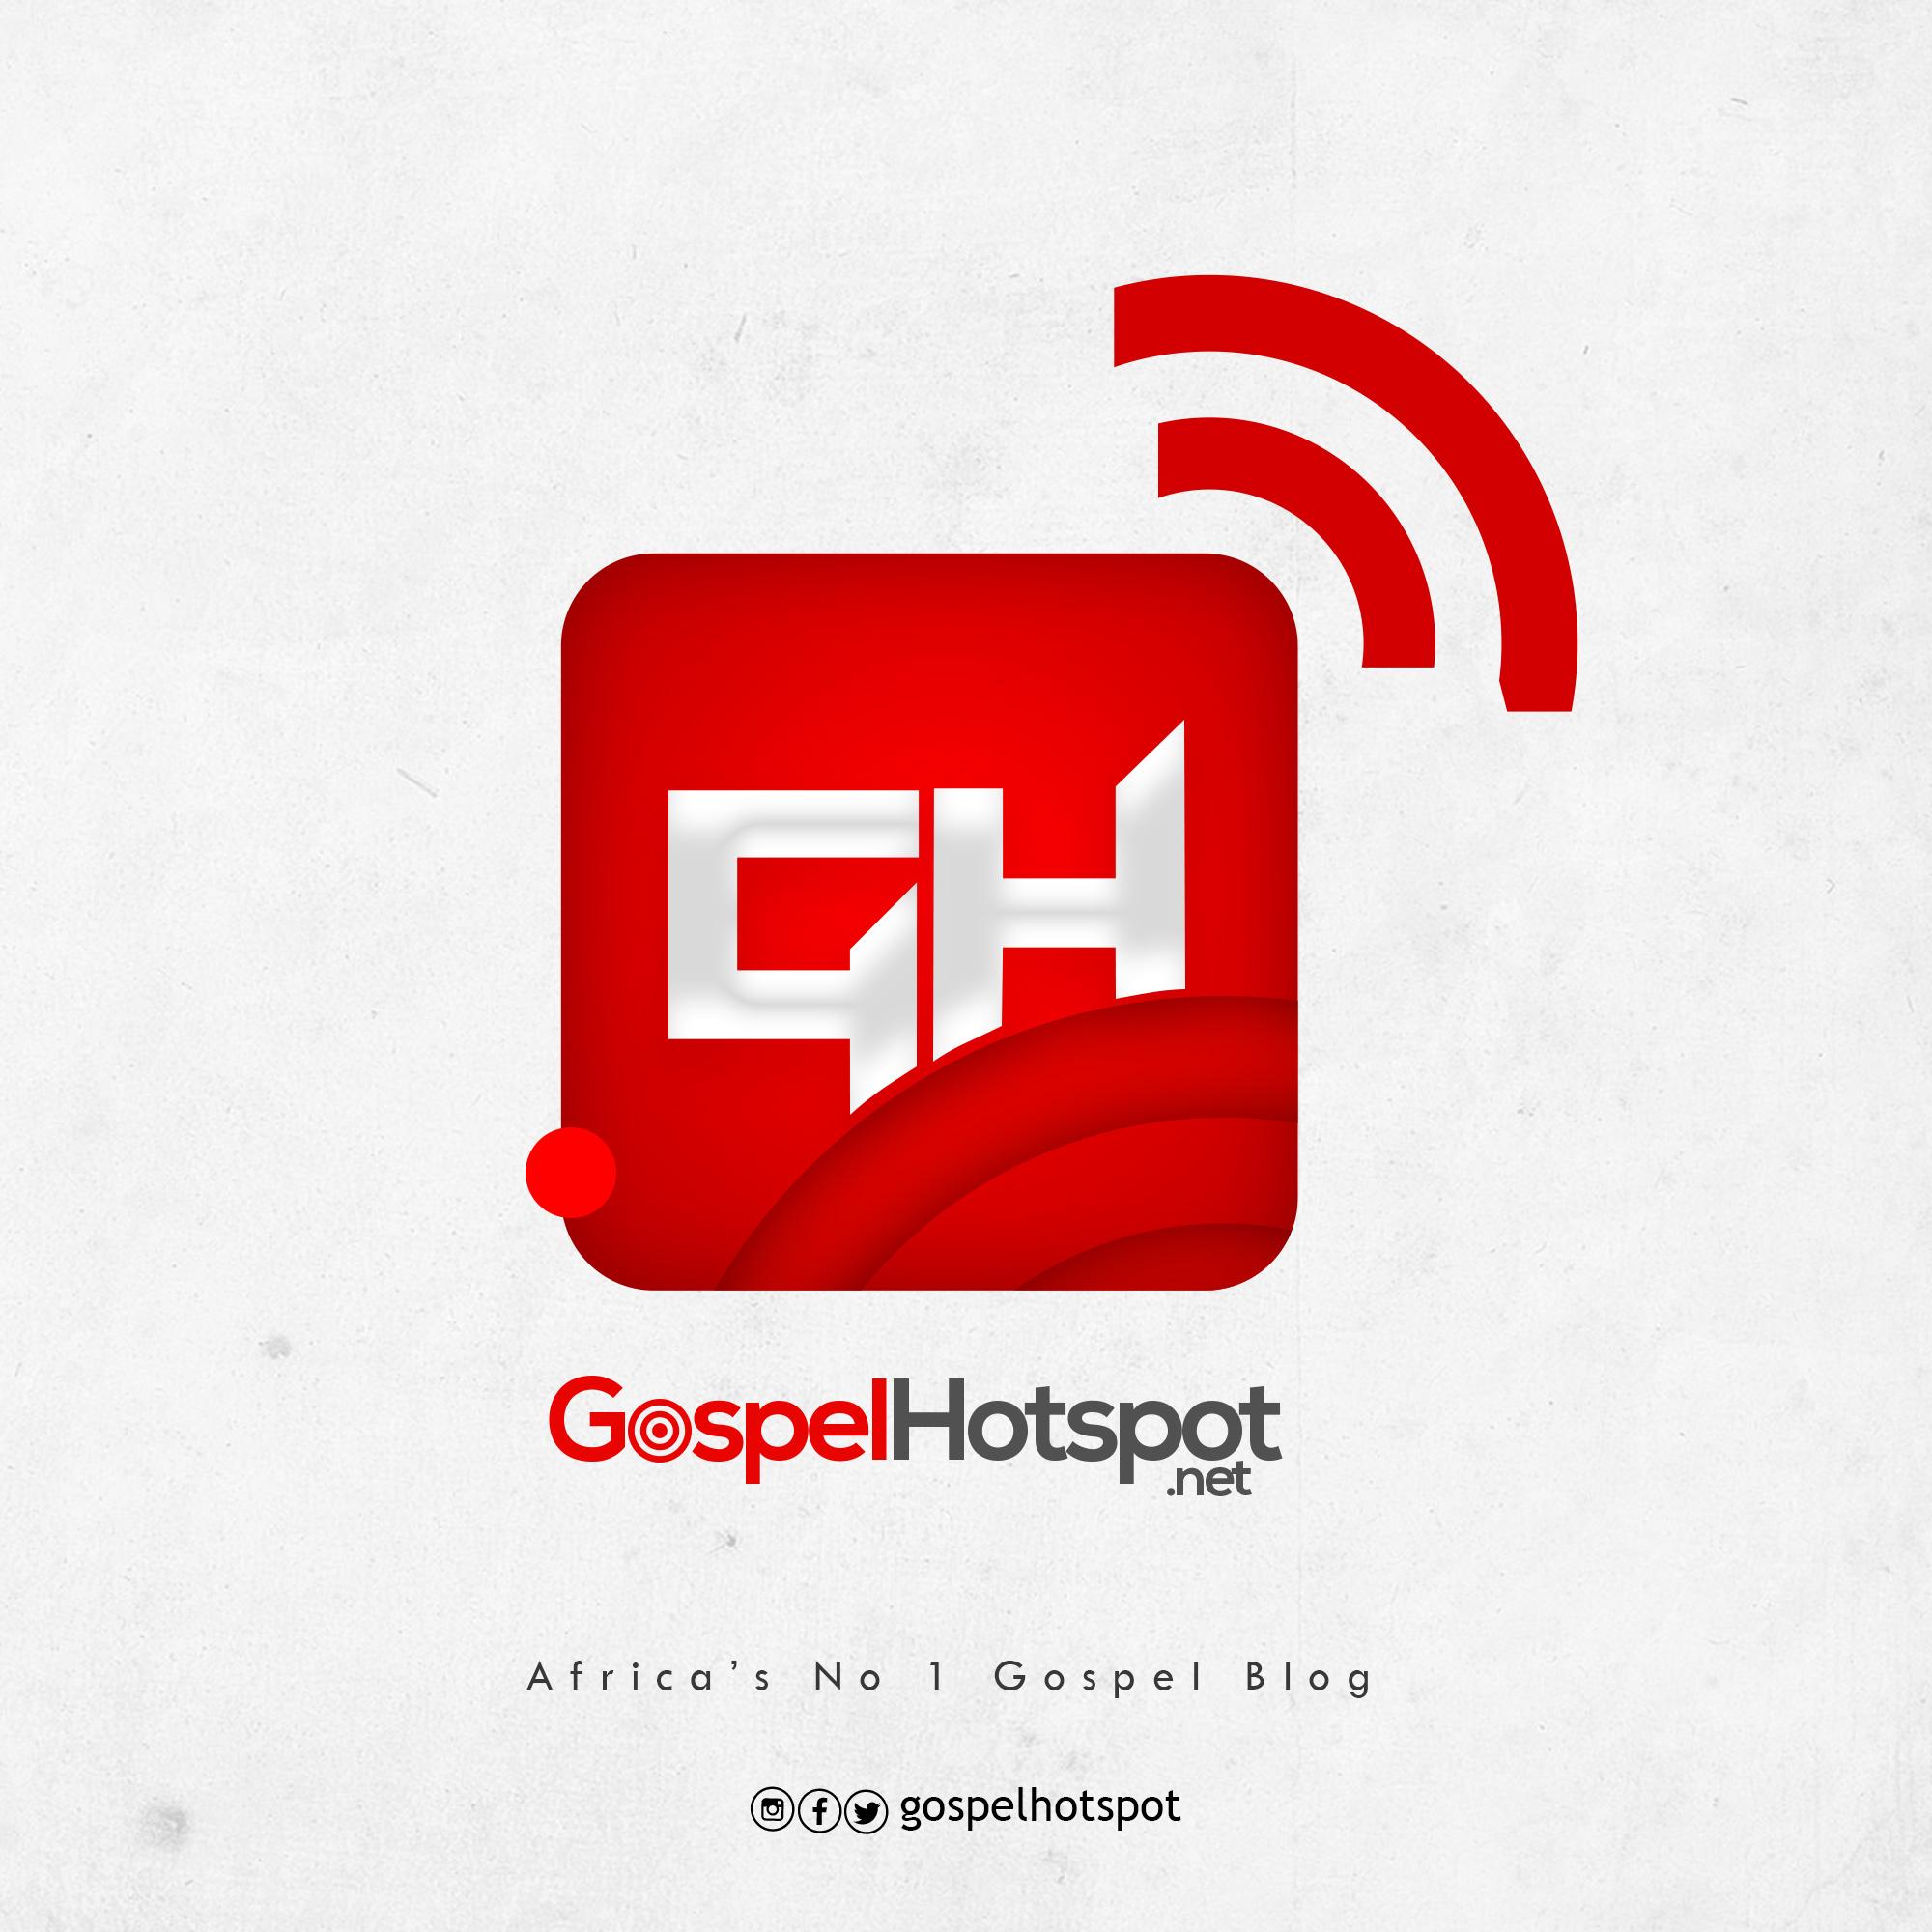 Download Latest Gospel Songs | www.GospelHotspot.net